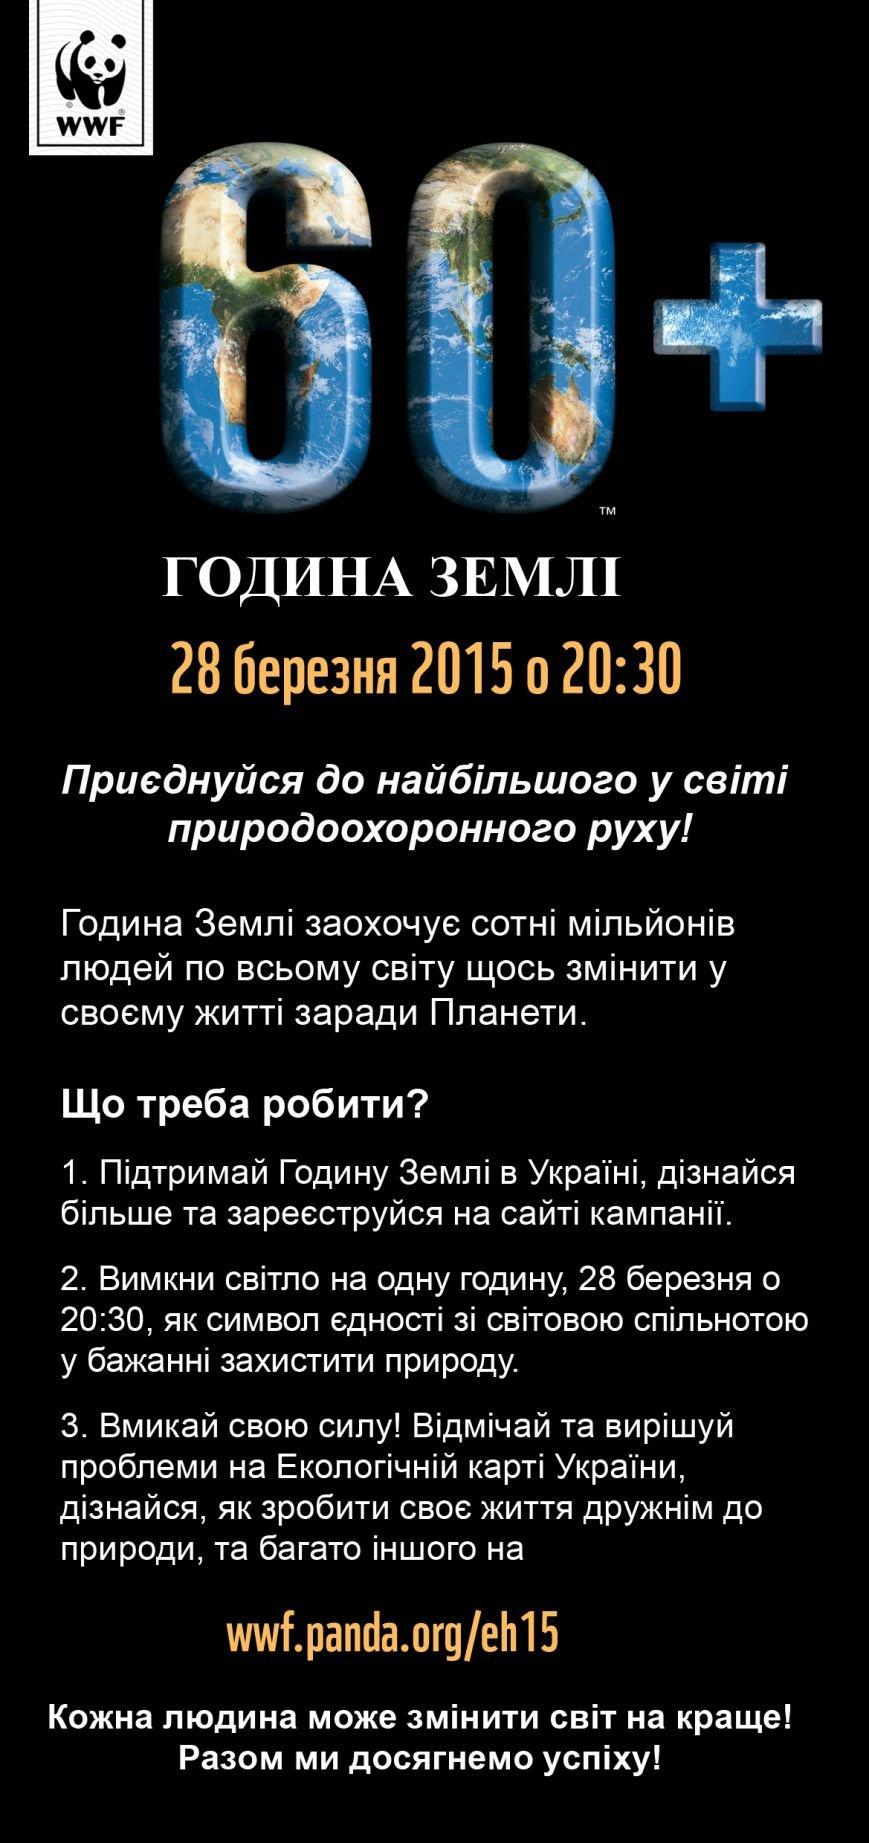 Earth_hour_FLYER_ukr